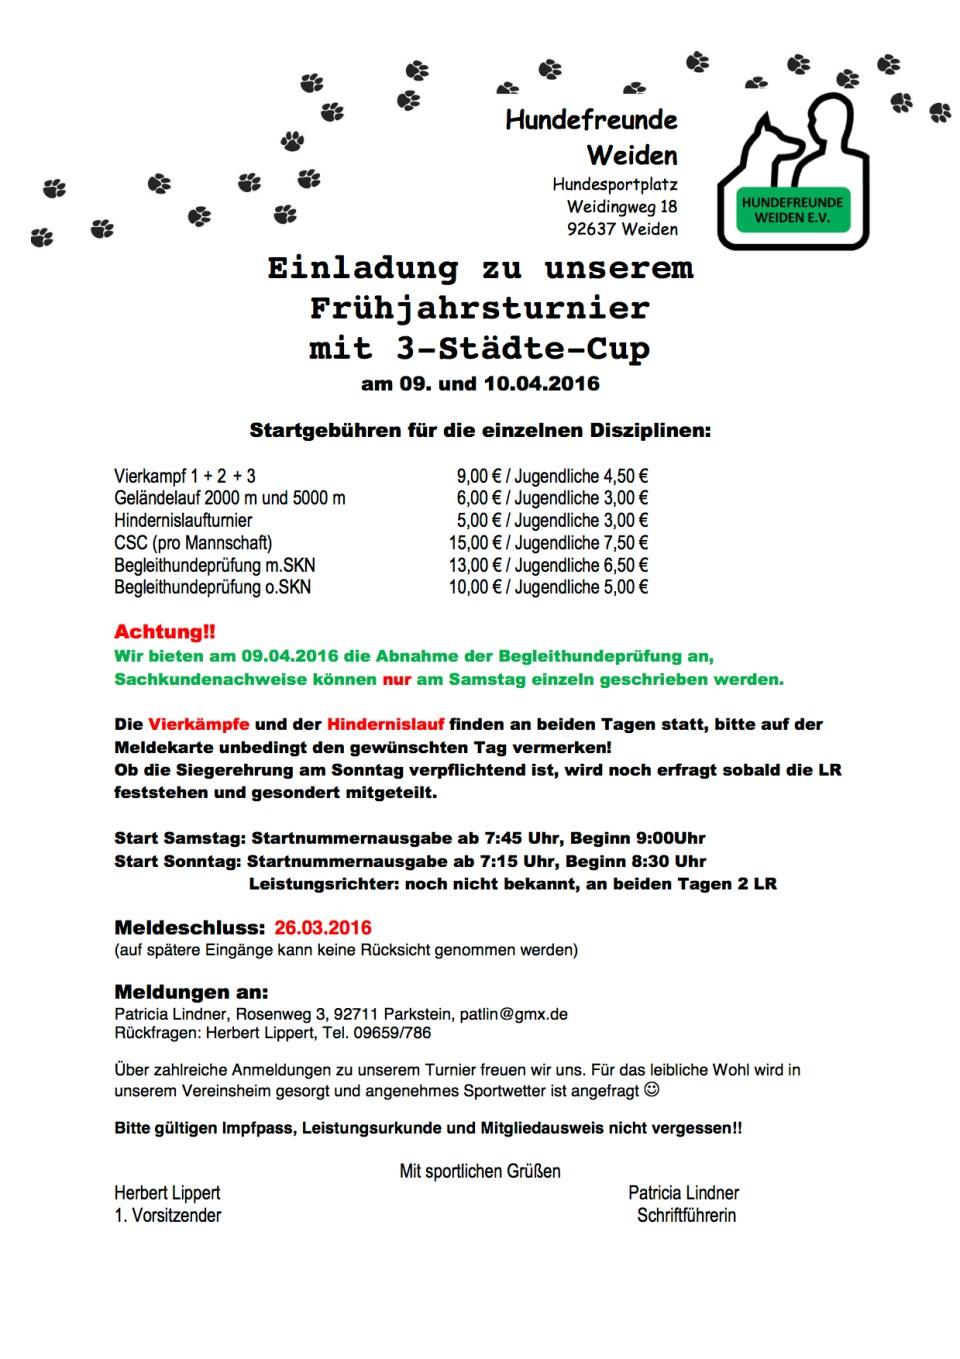 Einladung Frühjahrturnier_09-10042016